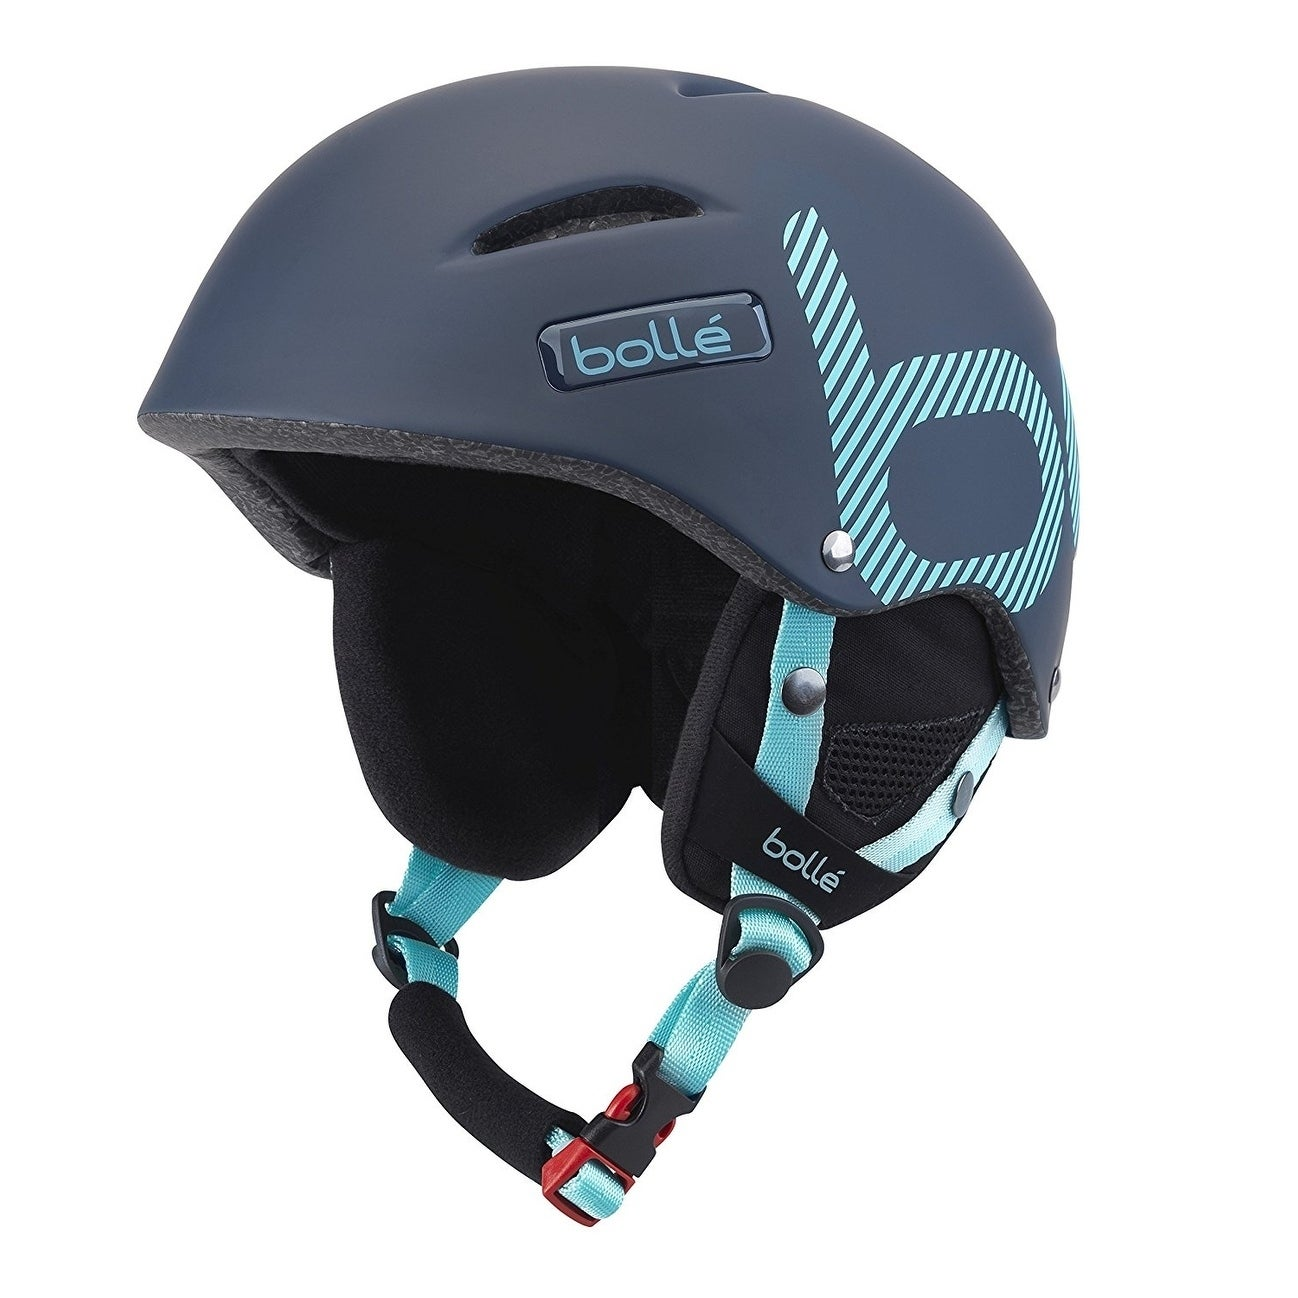 Soft Blue 58-61cm Bolle B-Style Ski Helmet